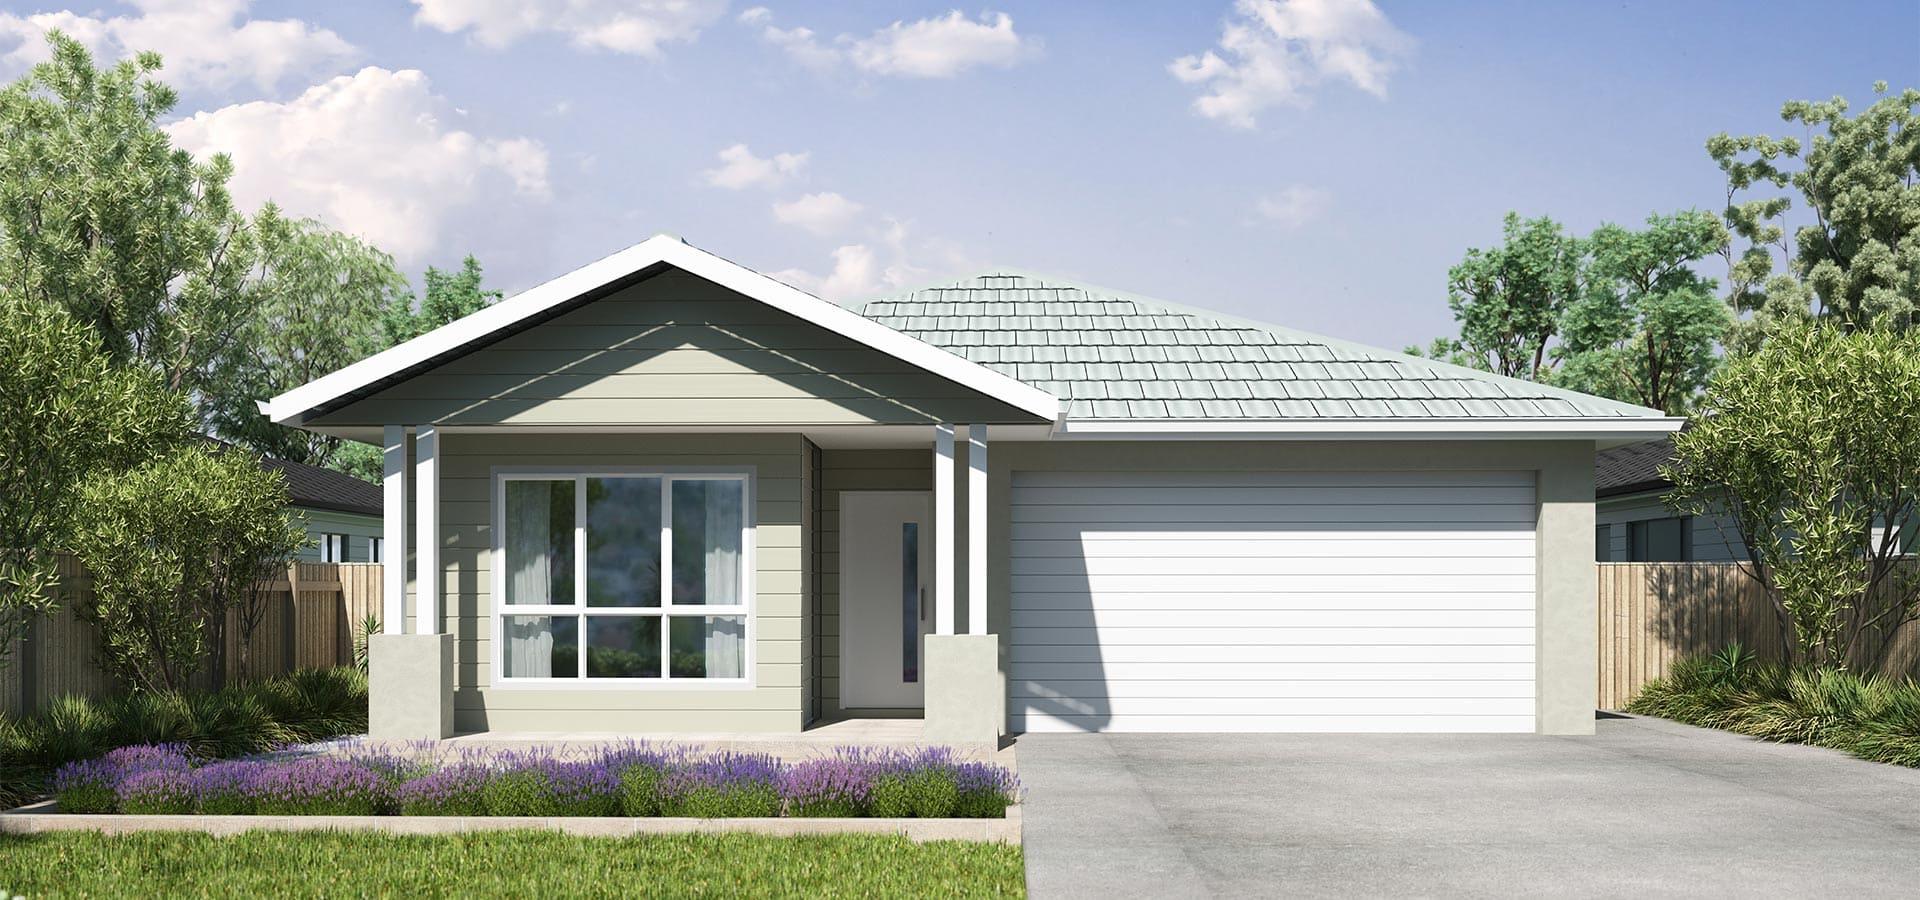 Waxflower-12-13-Single-House-Design